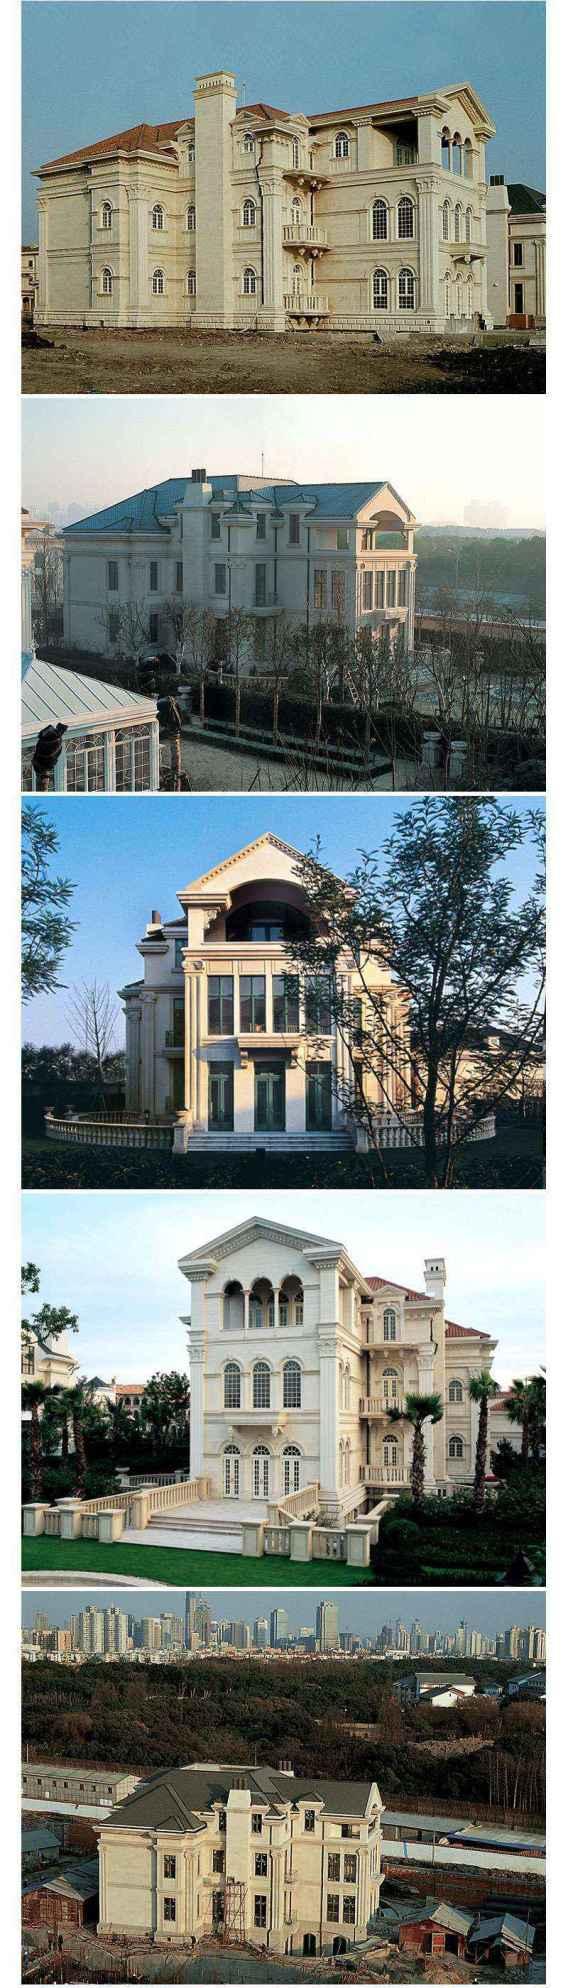 ★【Villa CAD Design,Details Project V.6-Italian Florentine Style】Chateau,Manor,Mansion,Villa@Autocad Blocks,Drawings,CAD Details,Elevation